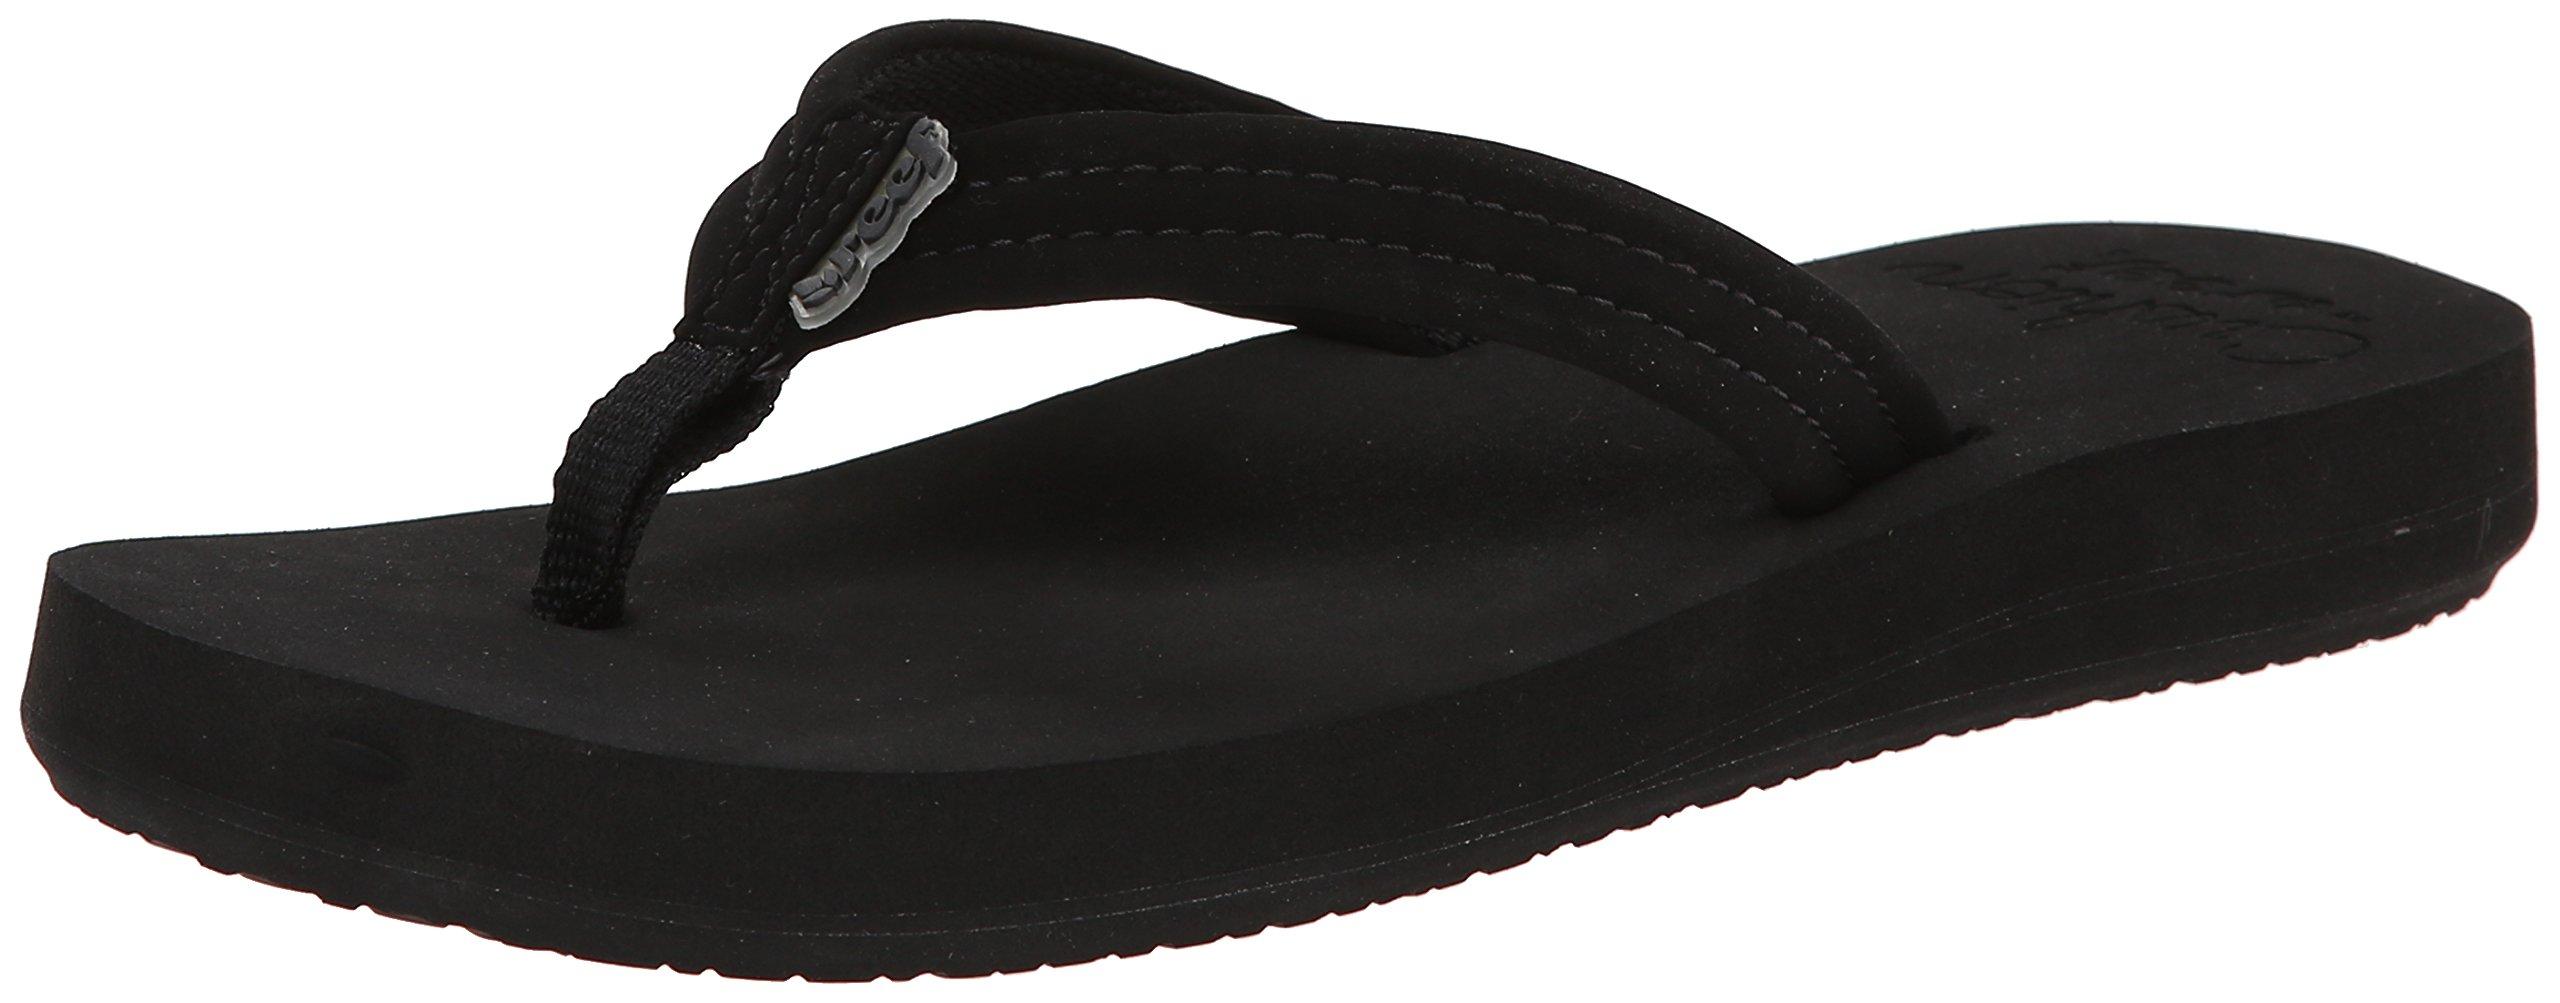 Reef Womens Cushion Breeze Flip-Flop Black Black 5 Bm -6521